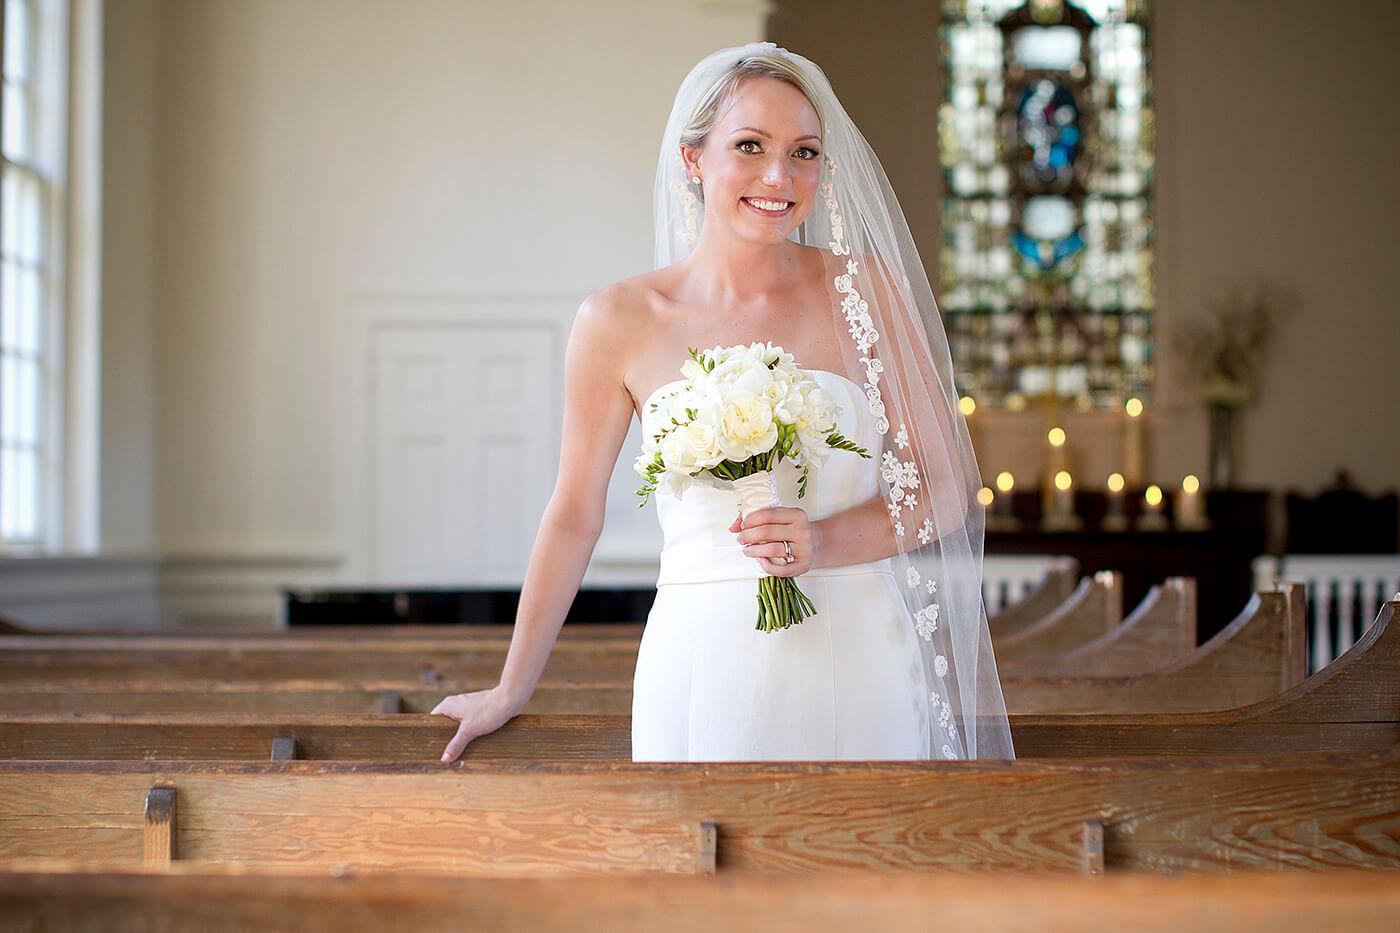 Wedding_Bridal_Photographer_Austin_Texas_Dennis_Burnett_32